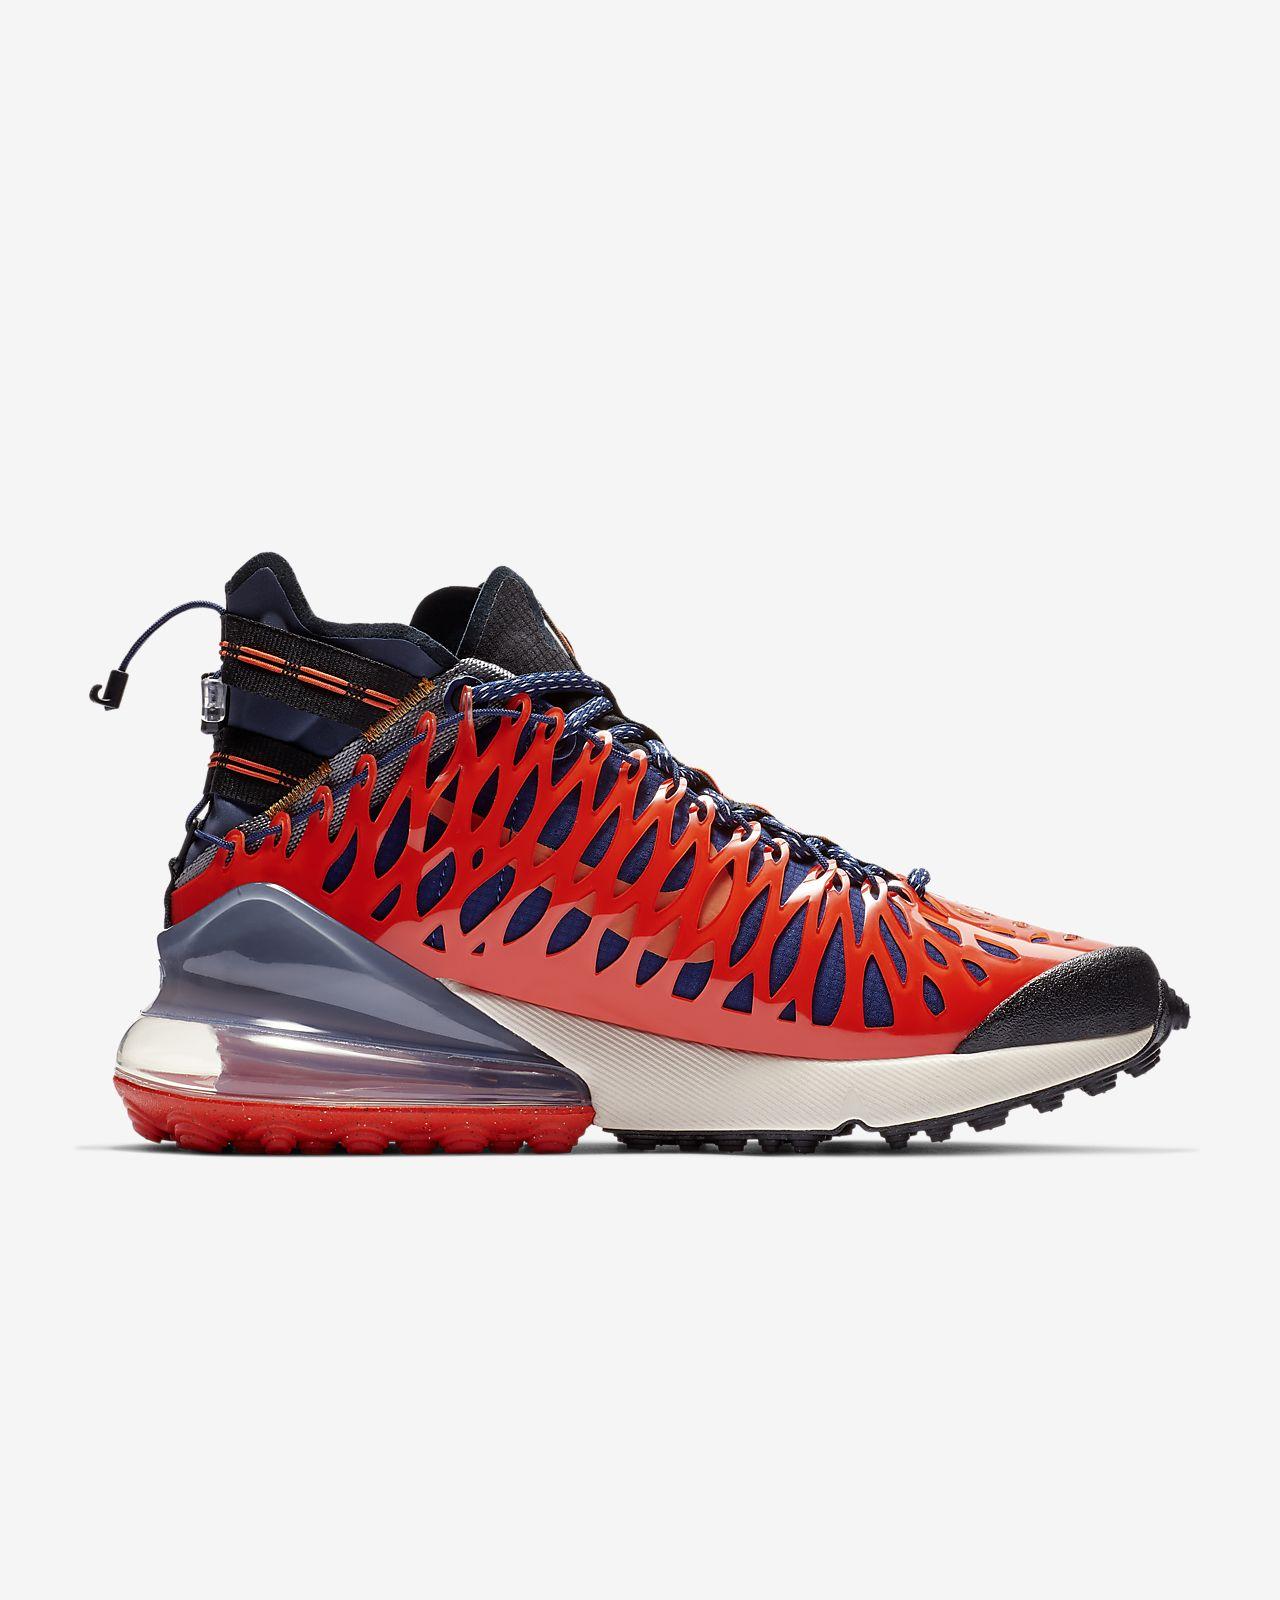 big sale c38f8 ba772 ... Nike Air Max 270 ISPA Men s Shoe